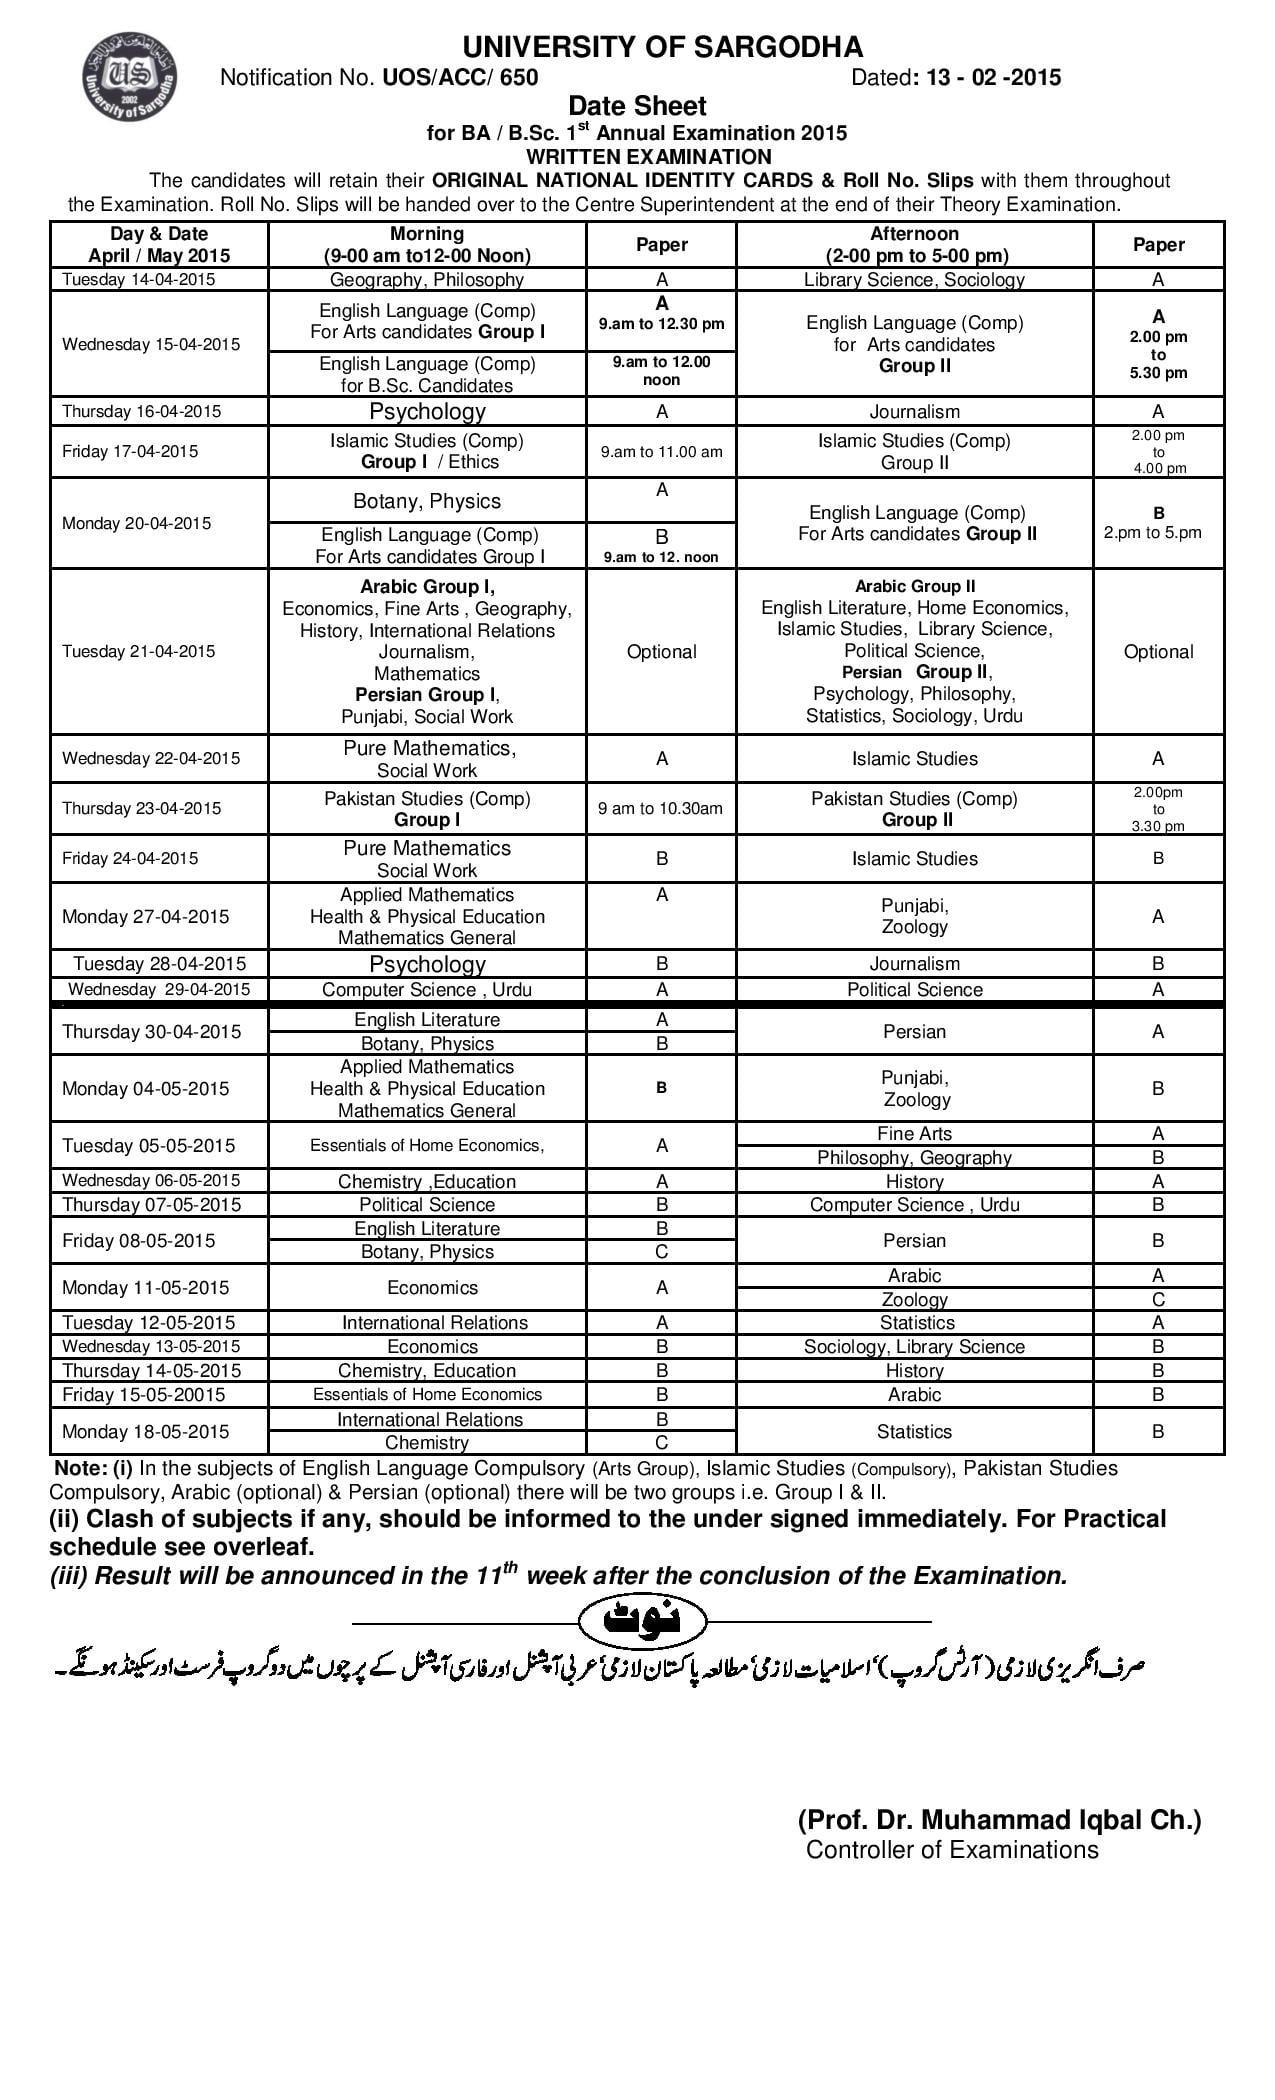 University of Sargodha UOS BA BSc Date Sheet Written